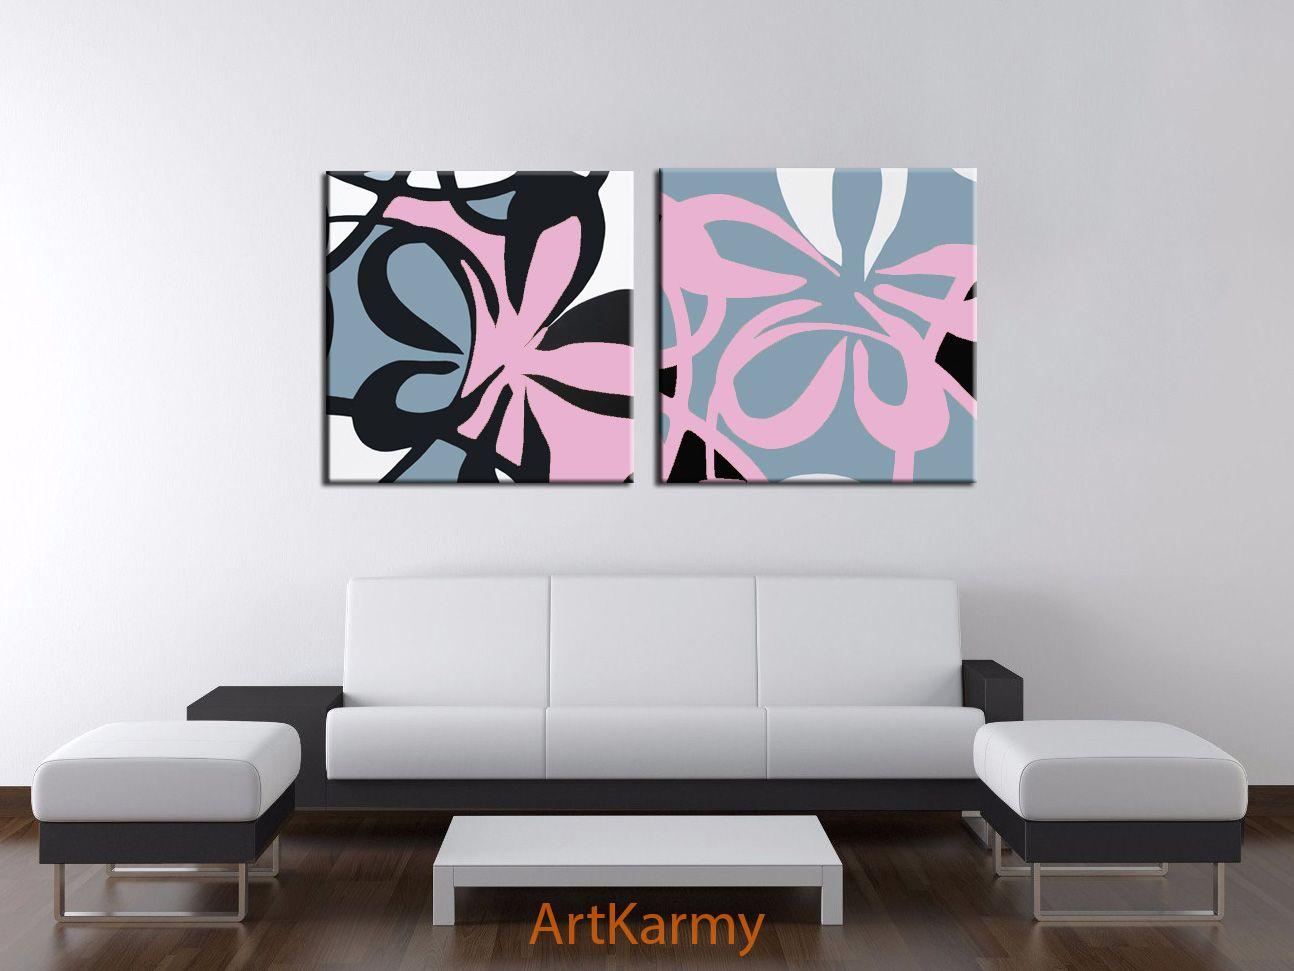 coppia di dipinti moderni   Dipinti moderni, Dipinti ...